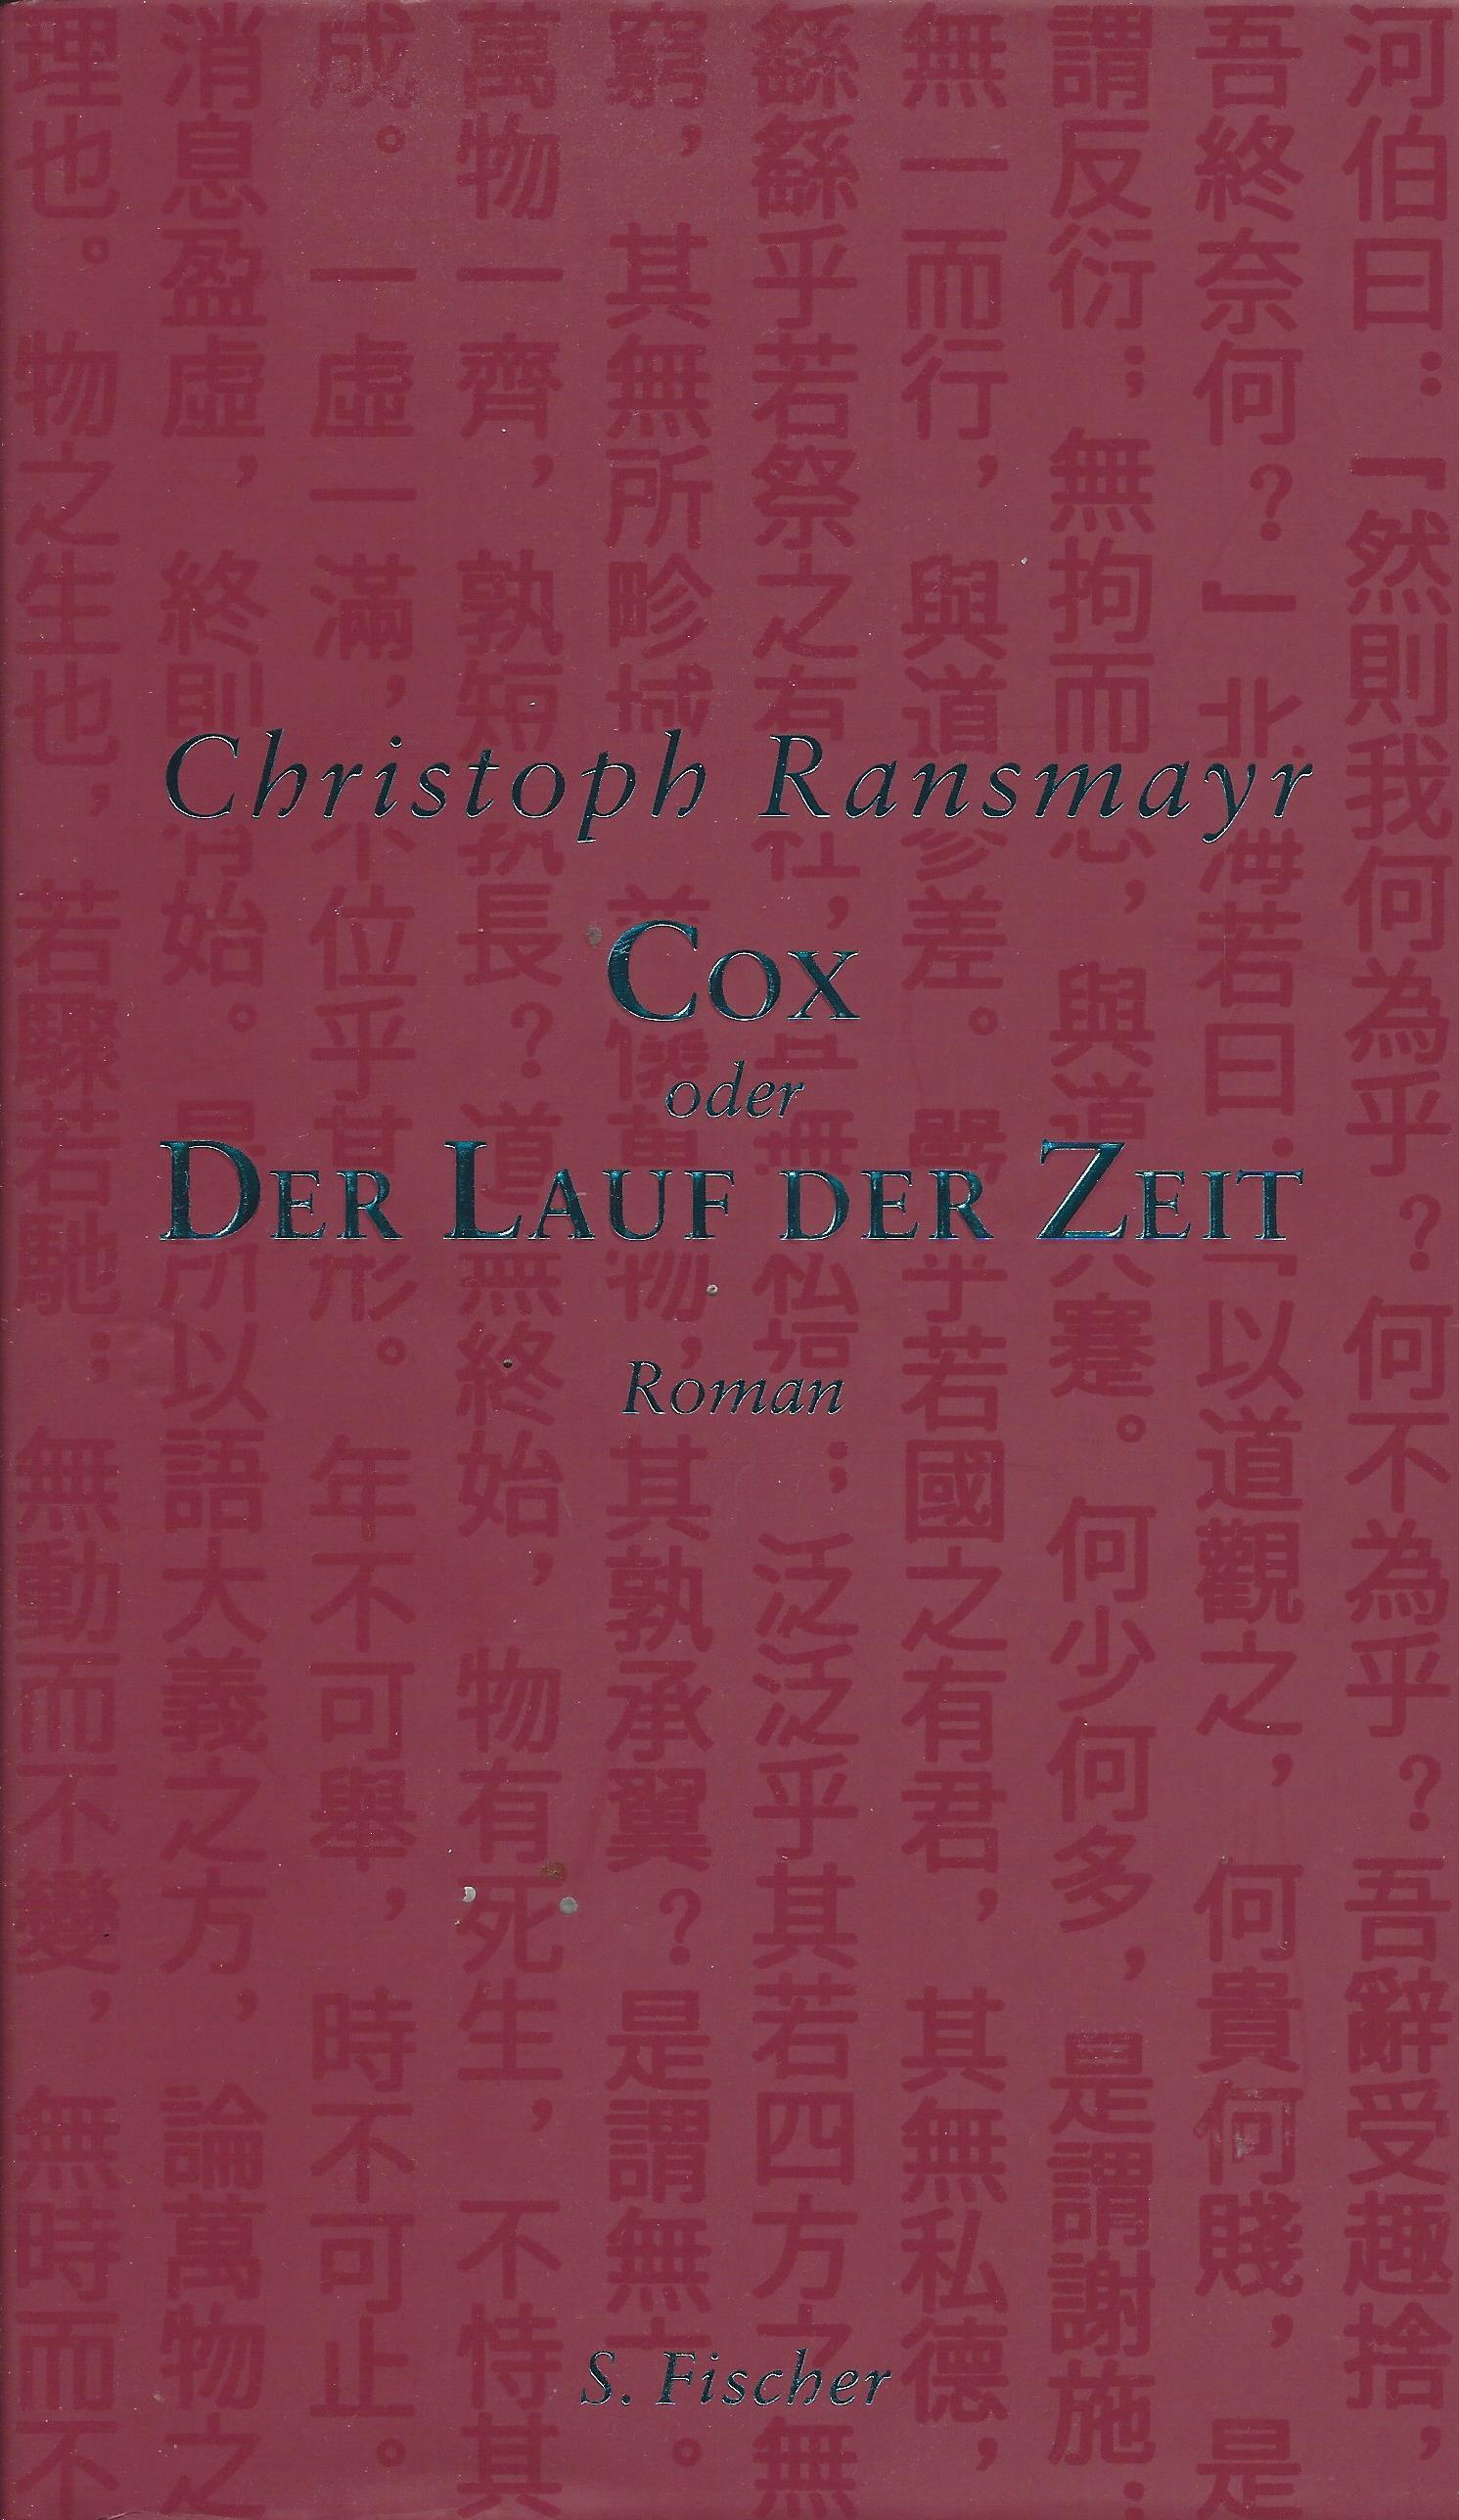 Christoph Ransmayr: Cox